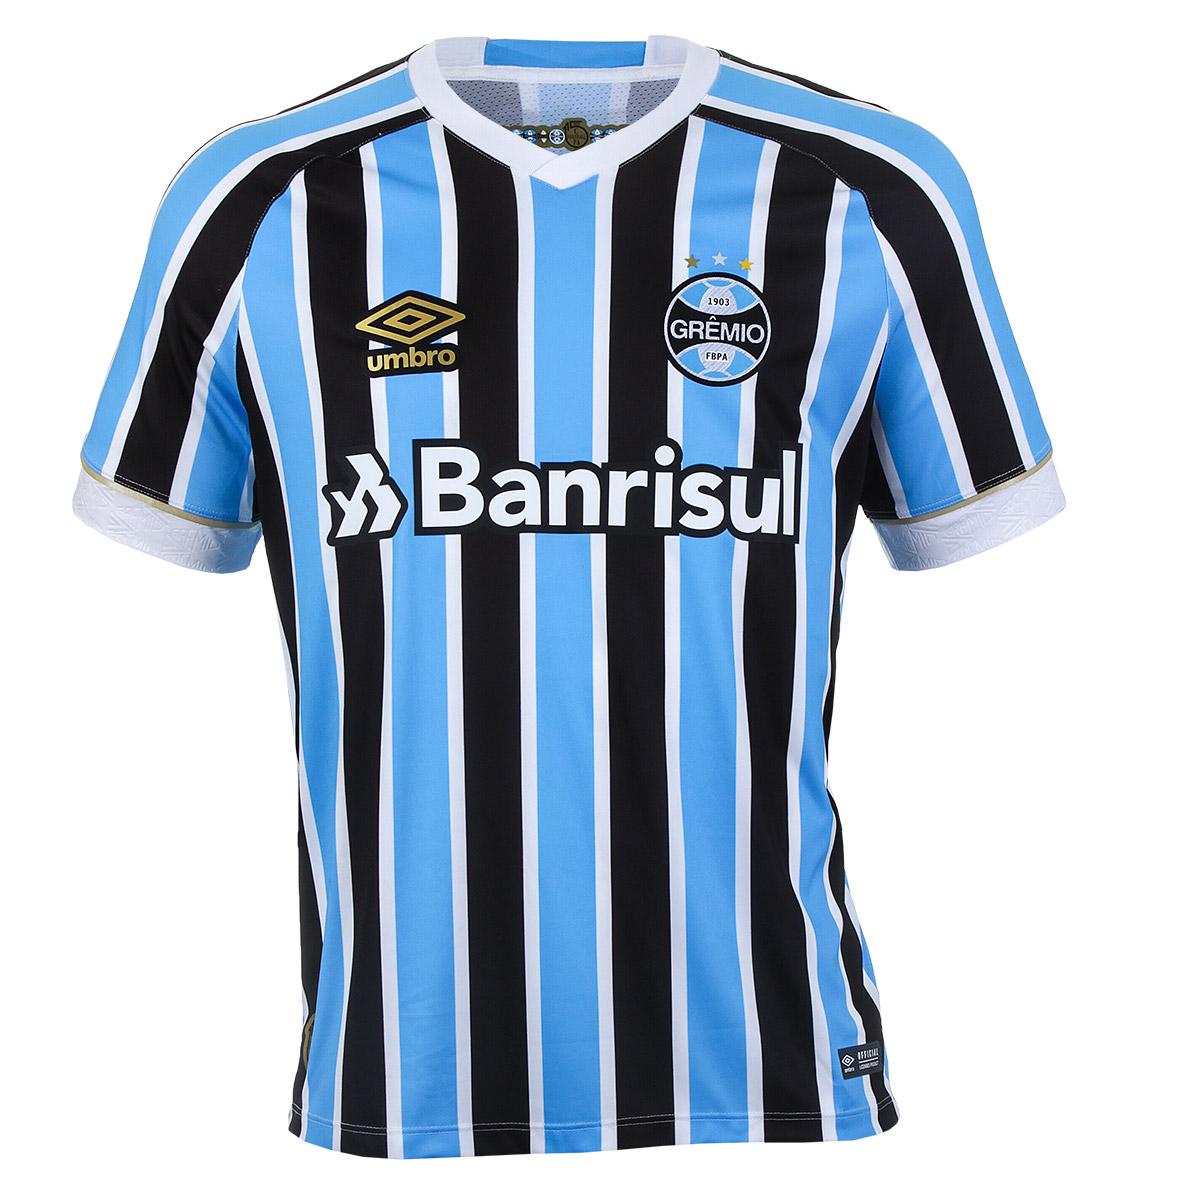 Camiseta Masc. Umbro Gremio Of. 1 2018 Futebol - Azul Celeste/Preto